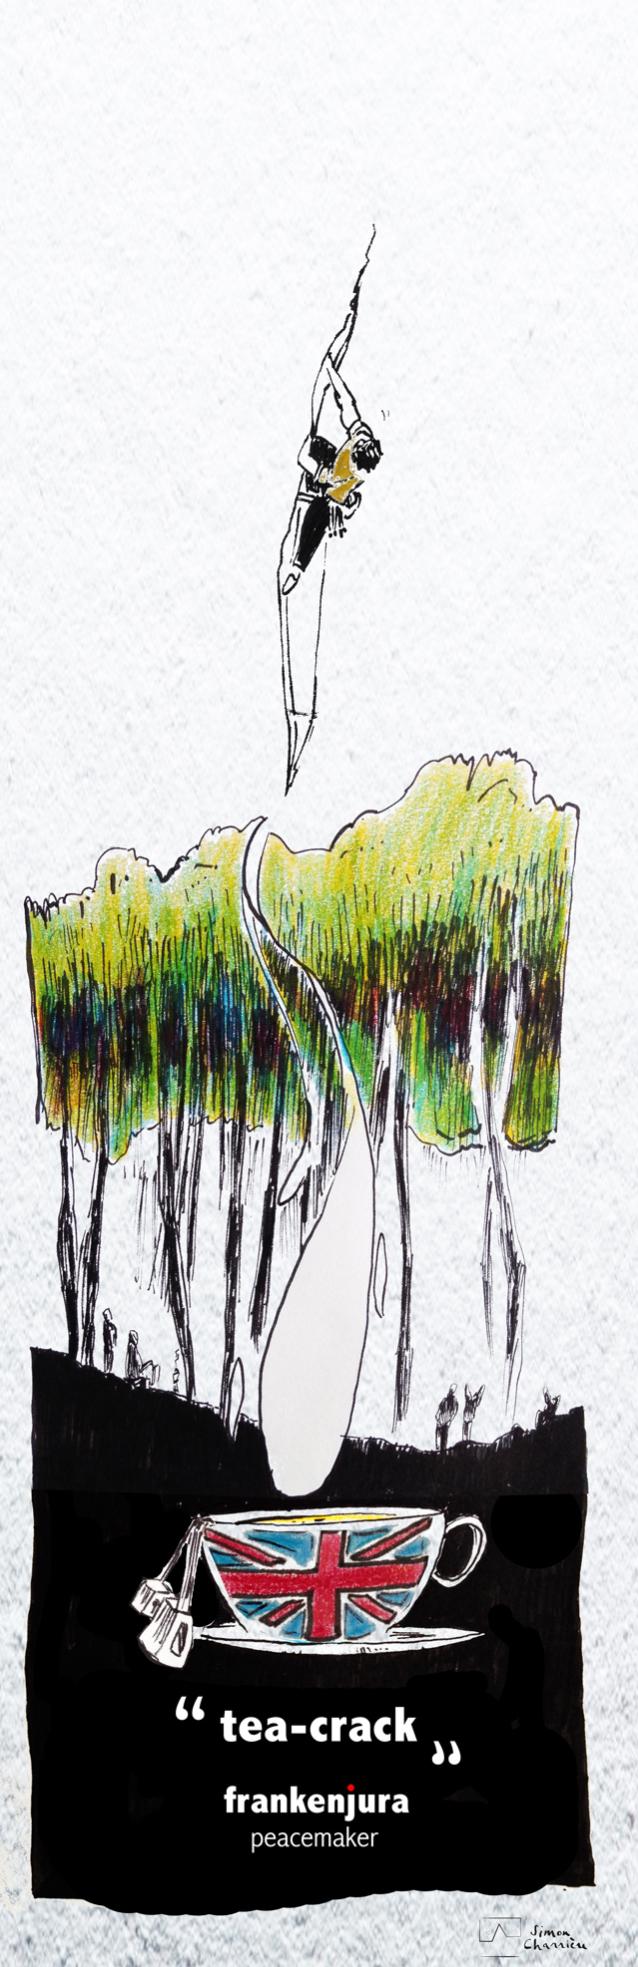 Artwork: Simon Charrière